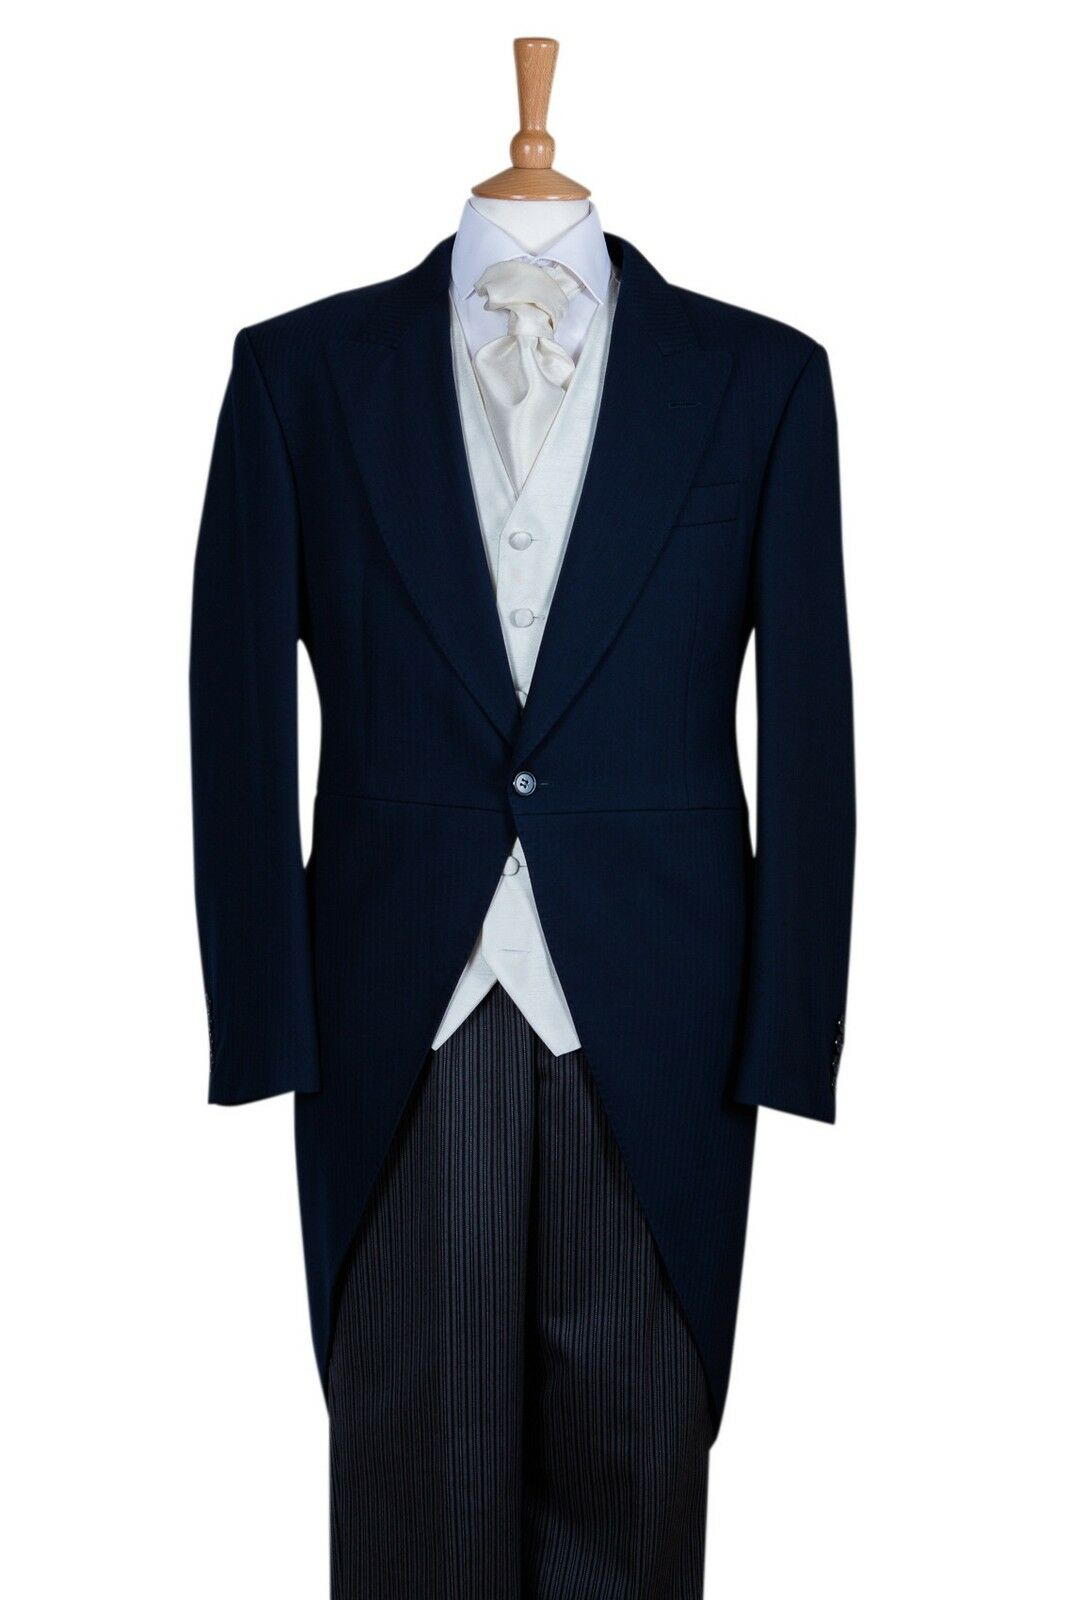 Three Peice navy bluee wool tailcoat Suit - Ex Hire